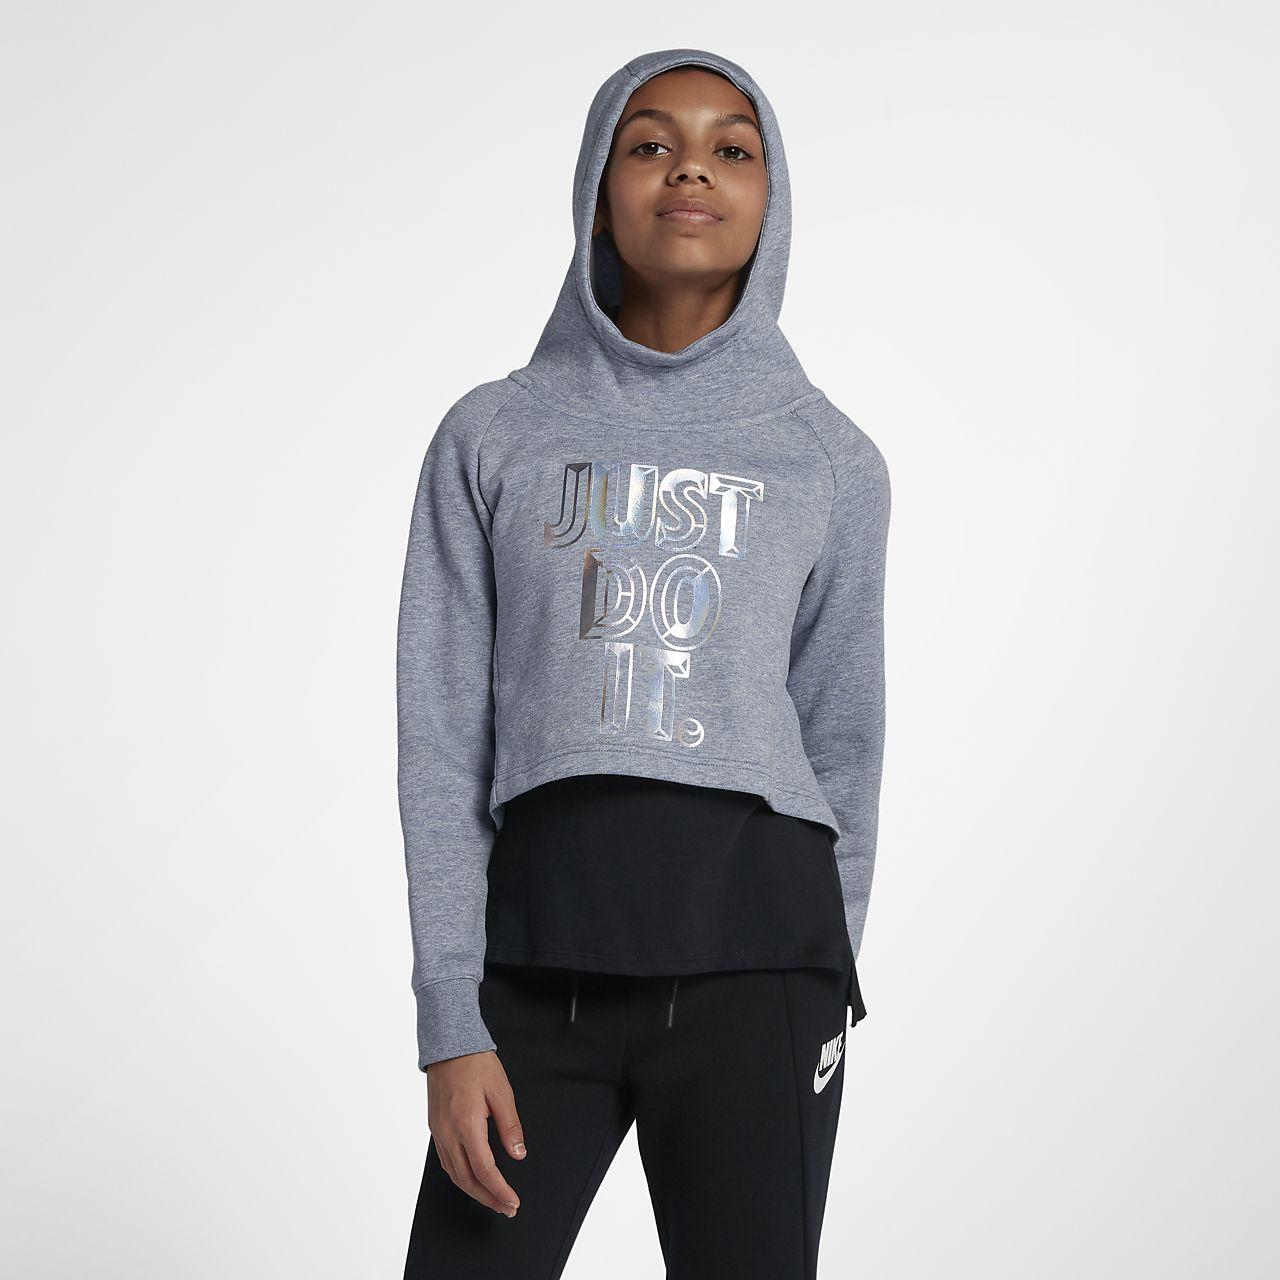 eeb29e5f4c Nike Sportswear Older Kids' (Girls') JDI Cropped Hoodie. Nike.com CA